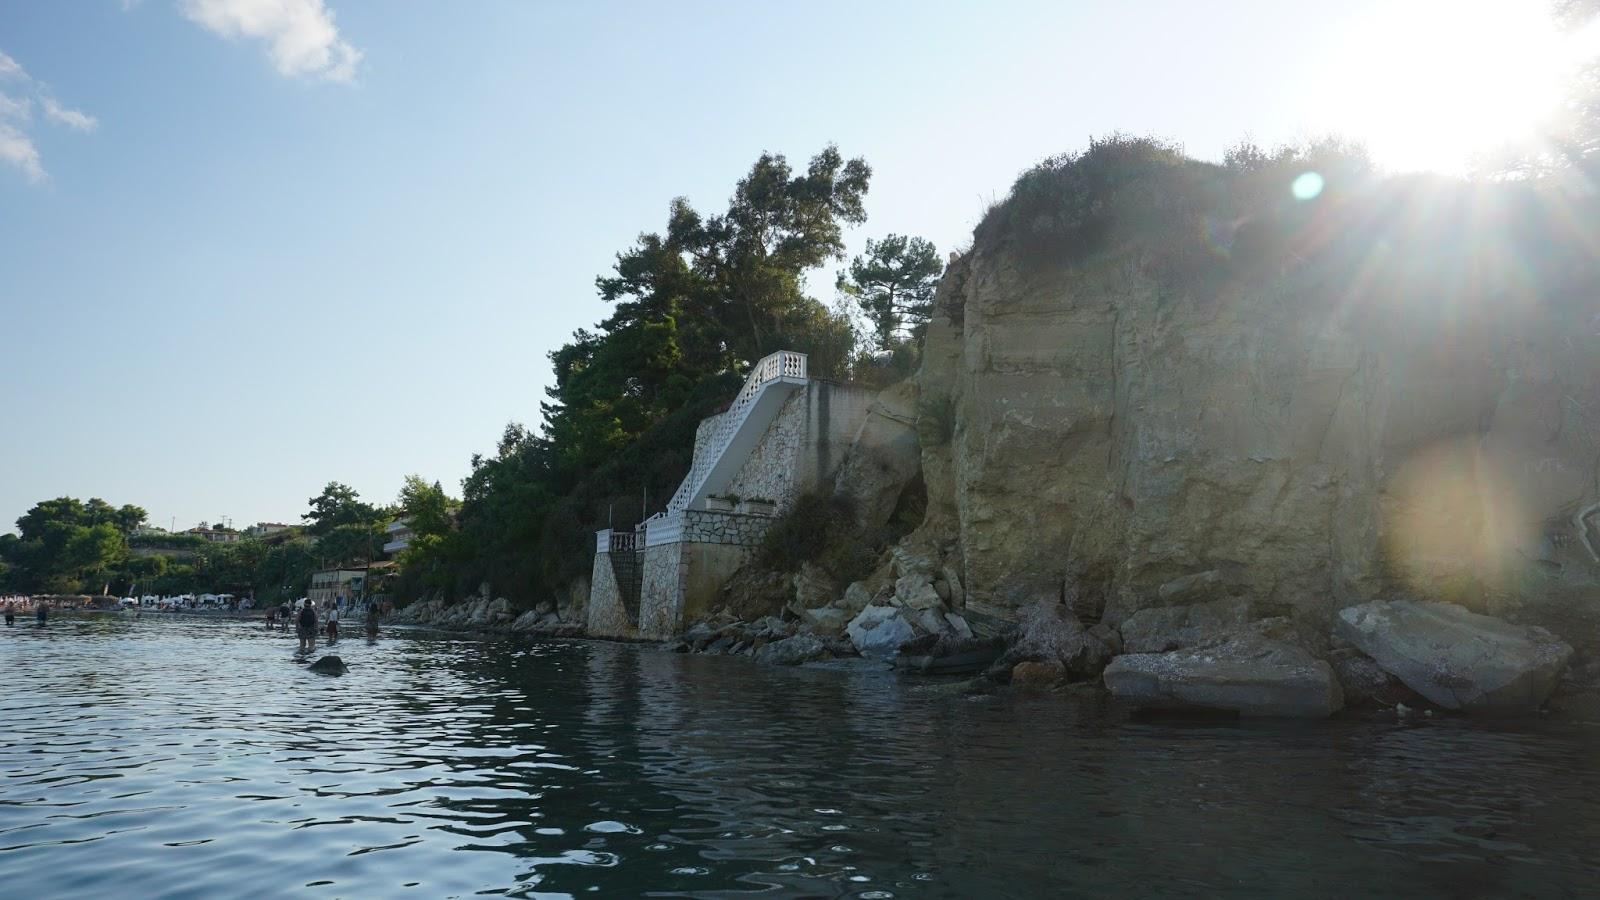 Agios Sostis, cameo island, wyspa cameo, zakintos, grecja